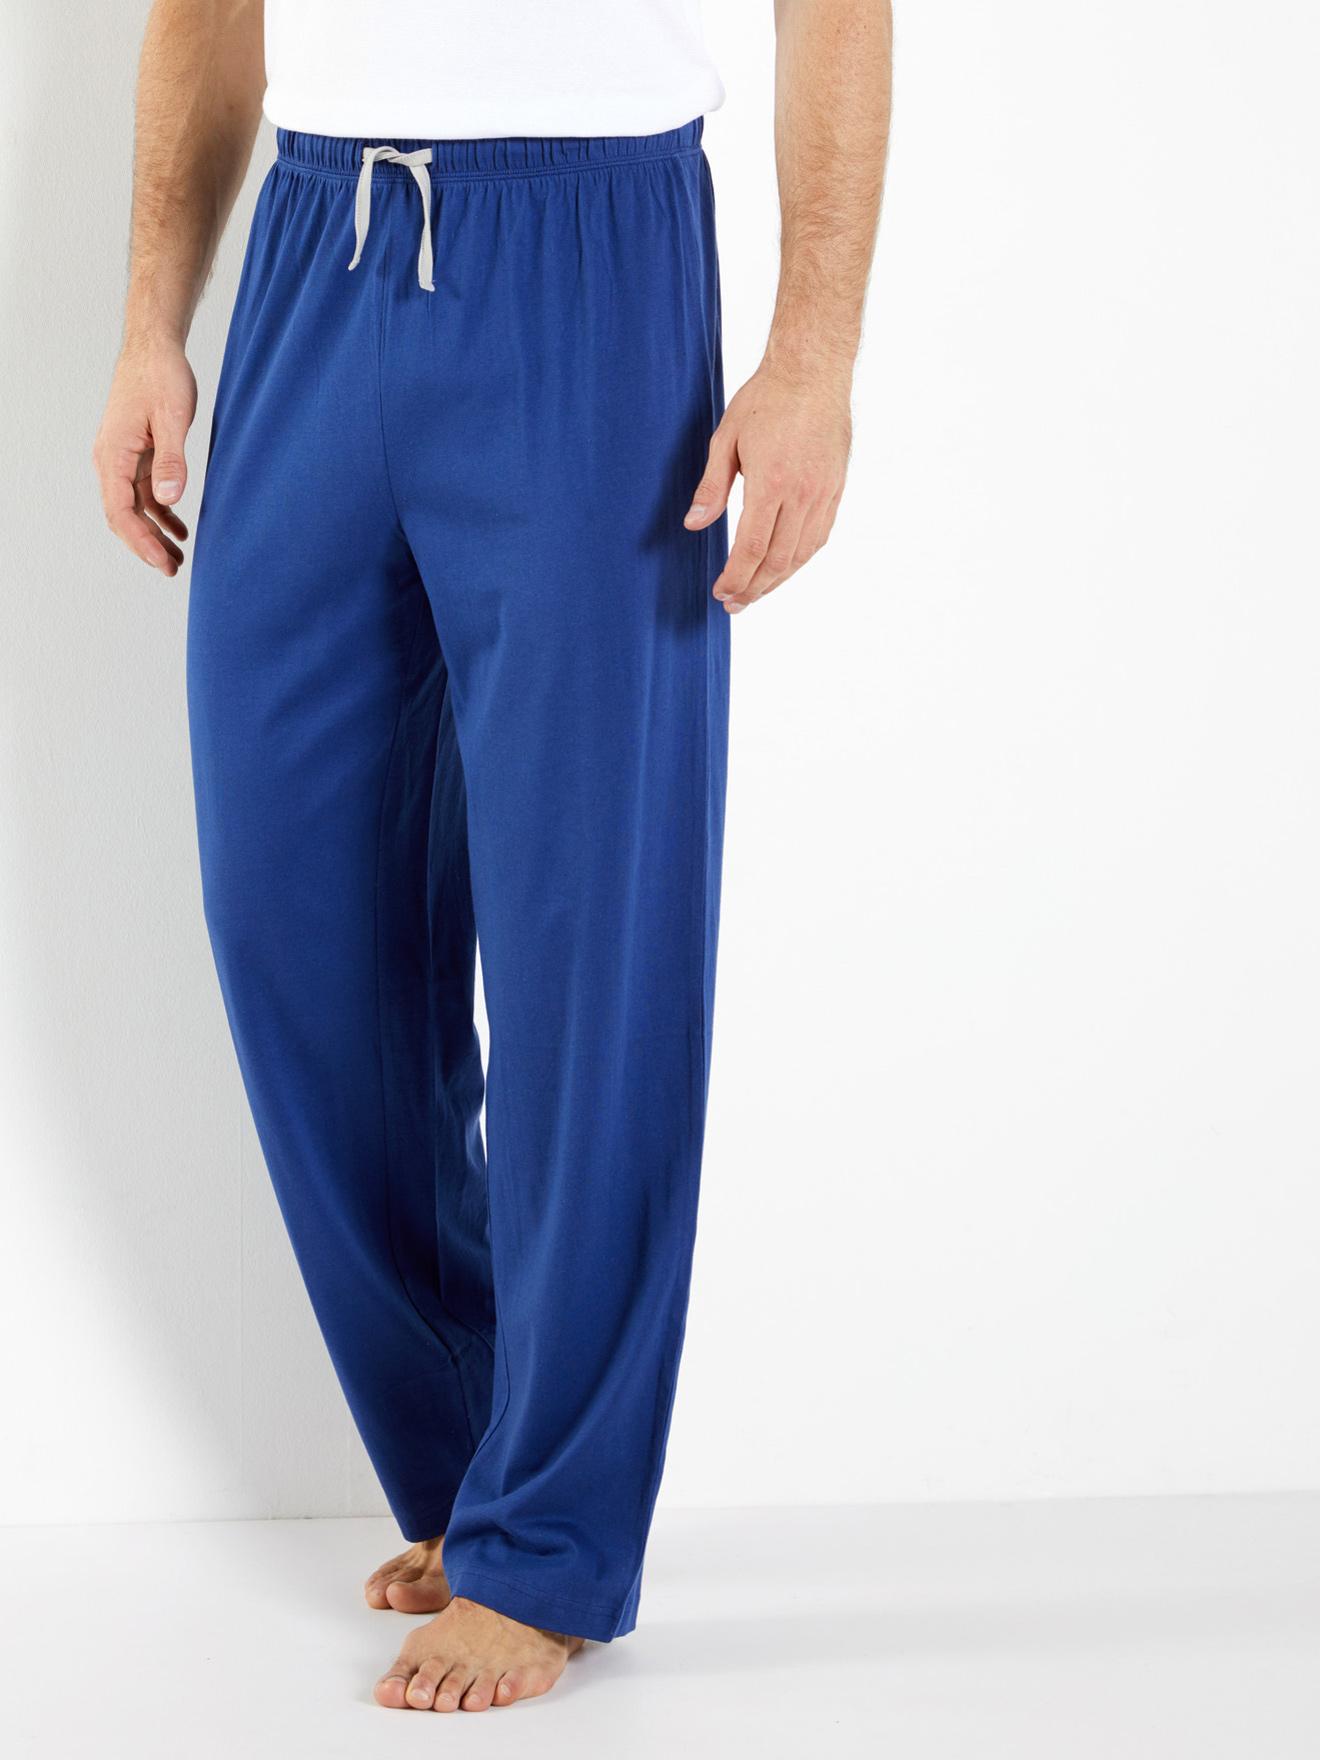 Pyjama homme, pantalon de pyjama & pyjama manches longues Vêtements homme   Kiabi